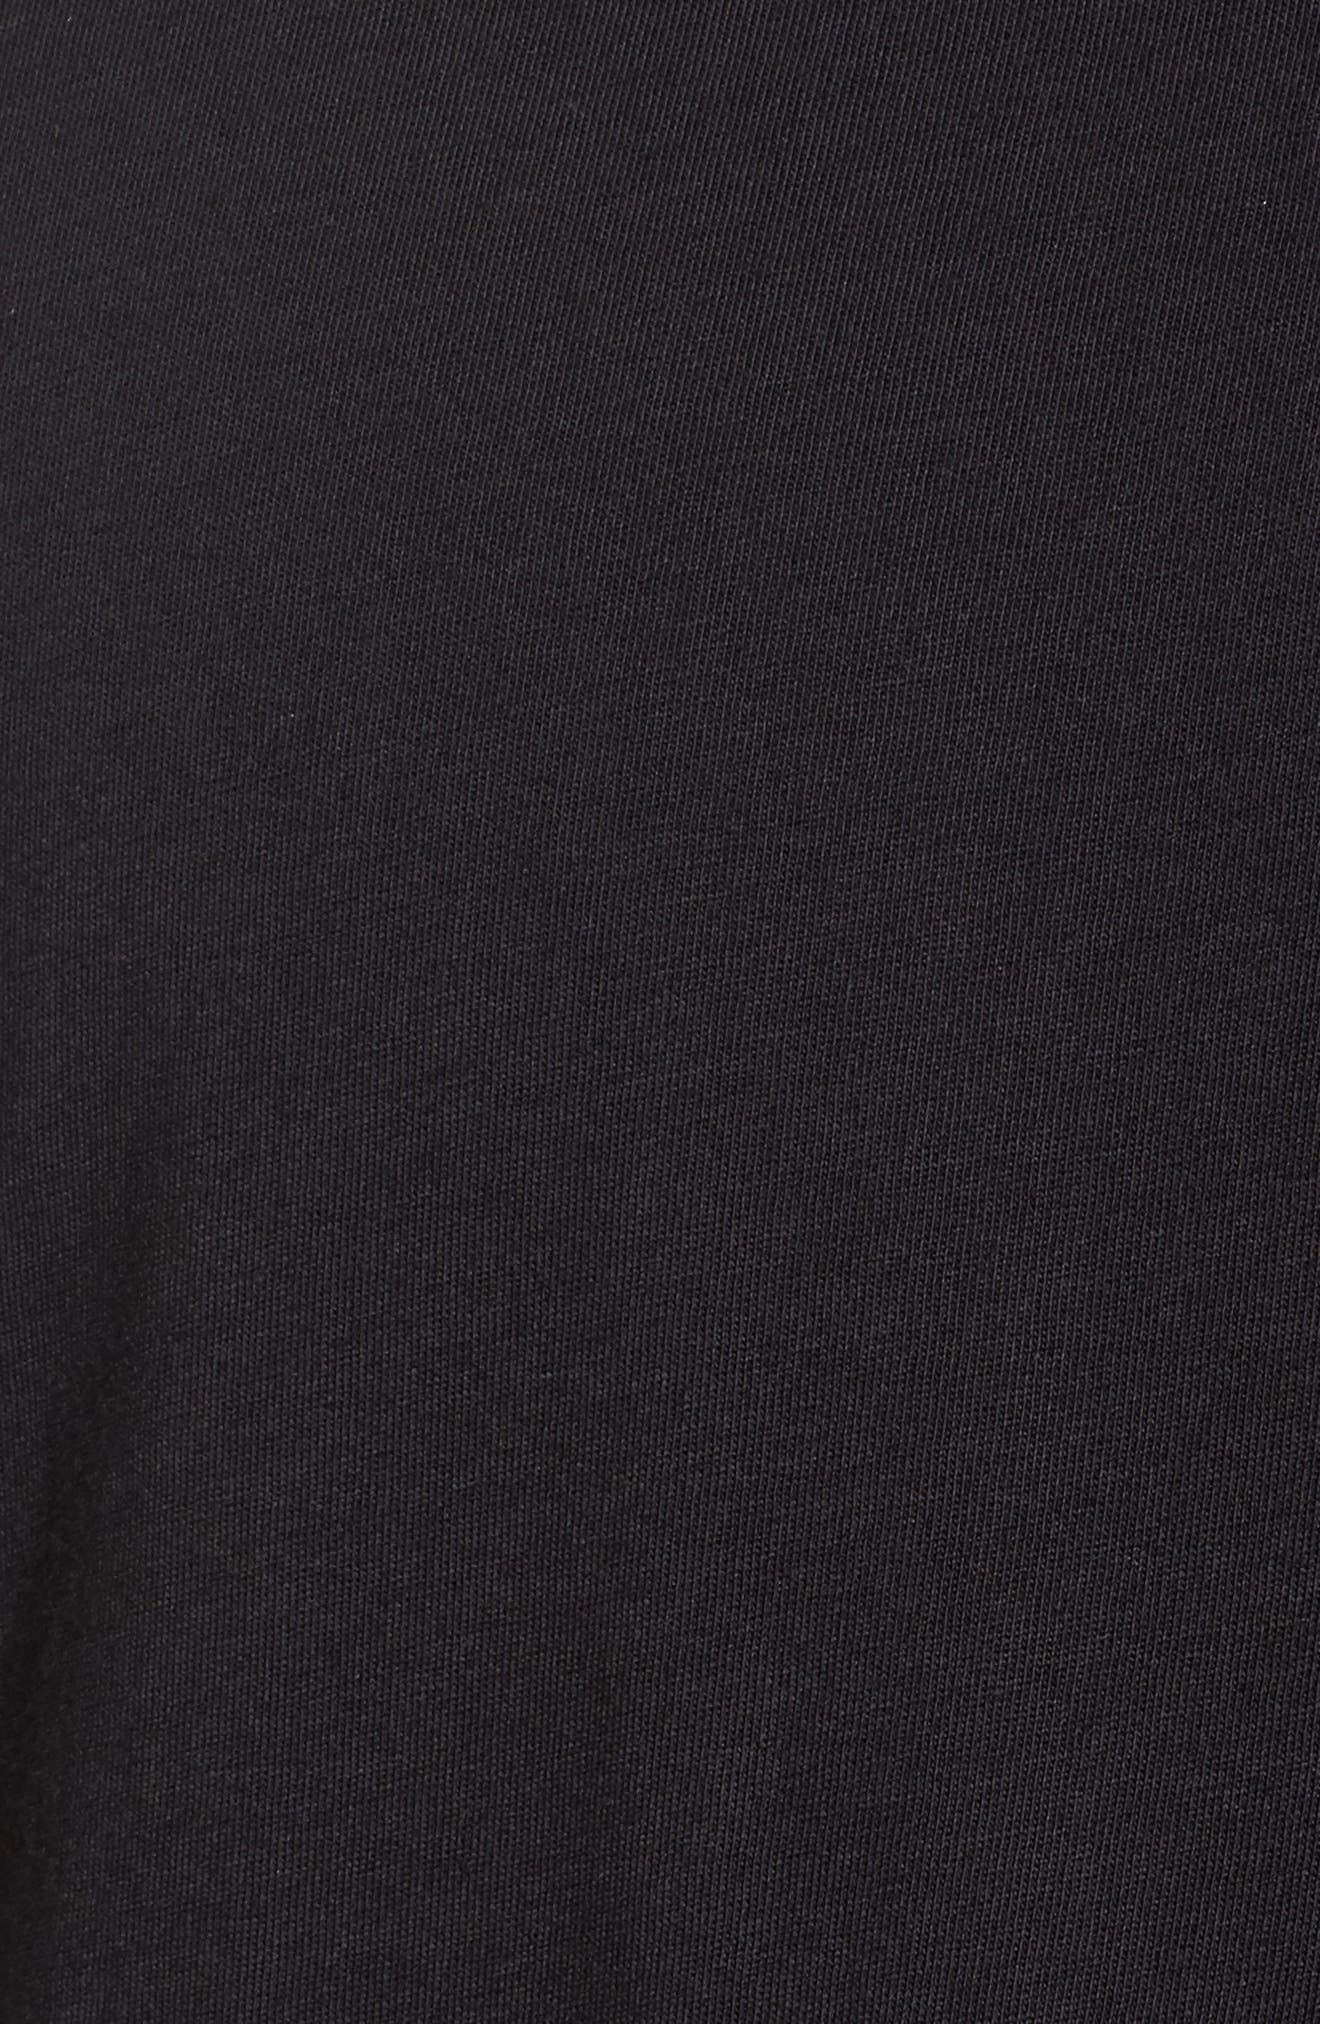 Hugo Boss Drison Hashmark Graphic T-Shirt,                             Alternate thumbnail 5, color,                             001